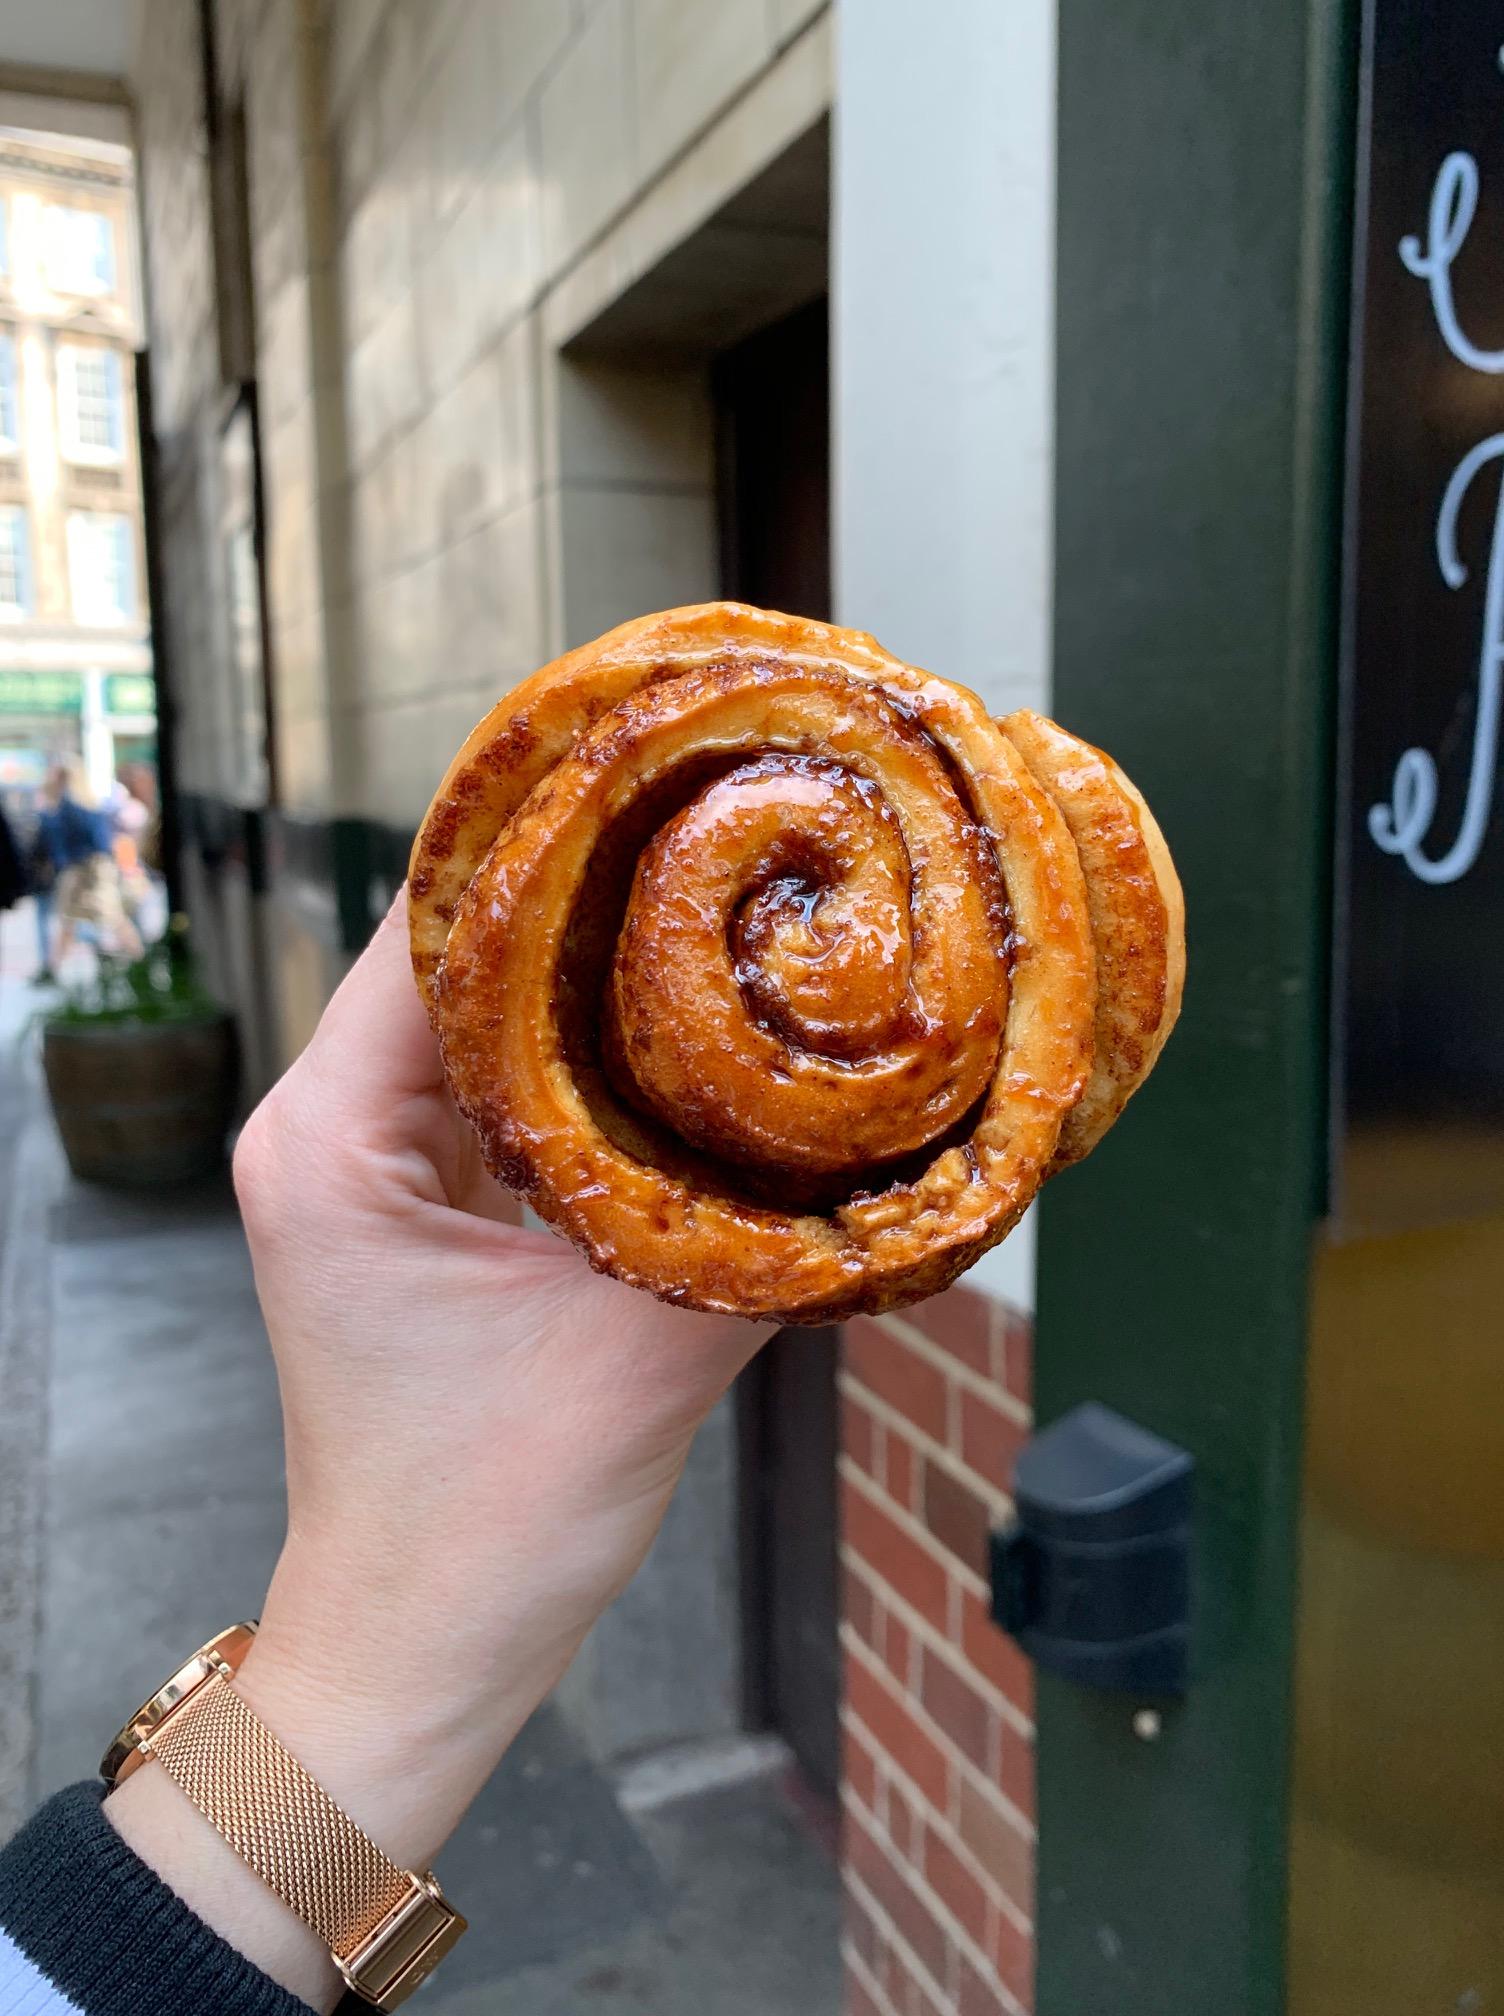 Borough Market - Bread Ahead Bakery (Cinnamon Scroll)